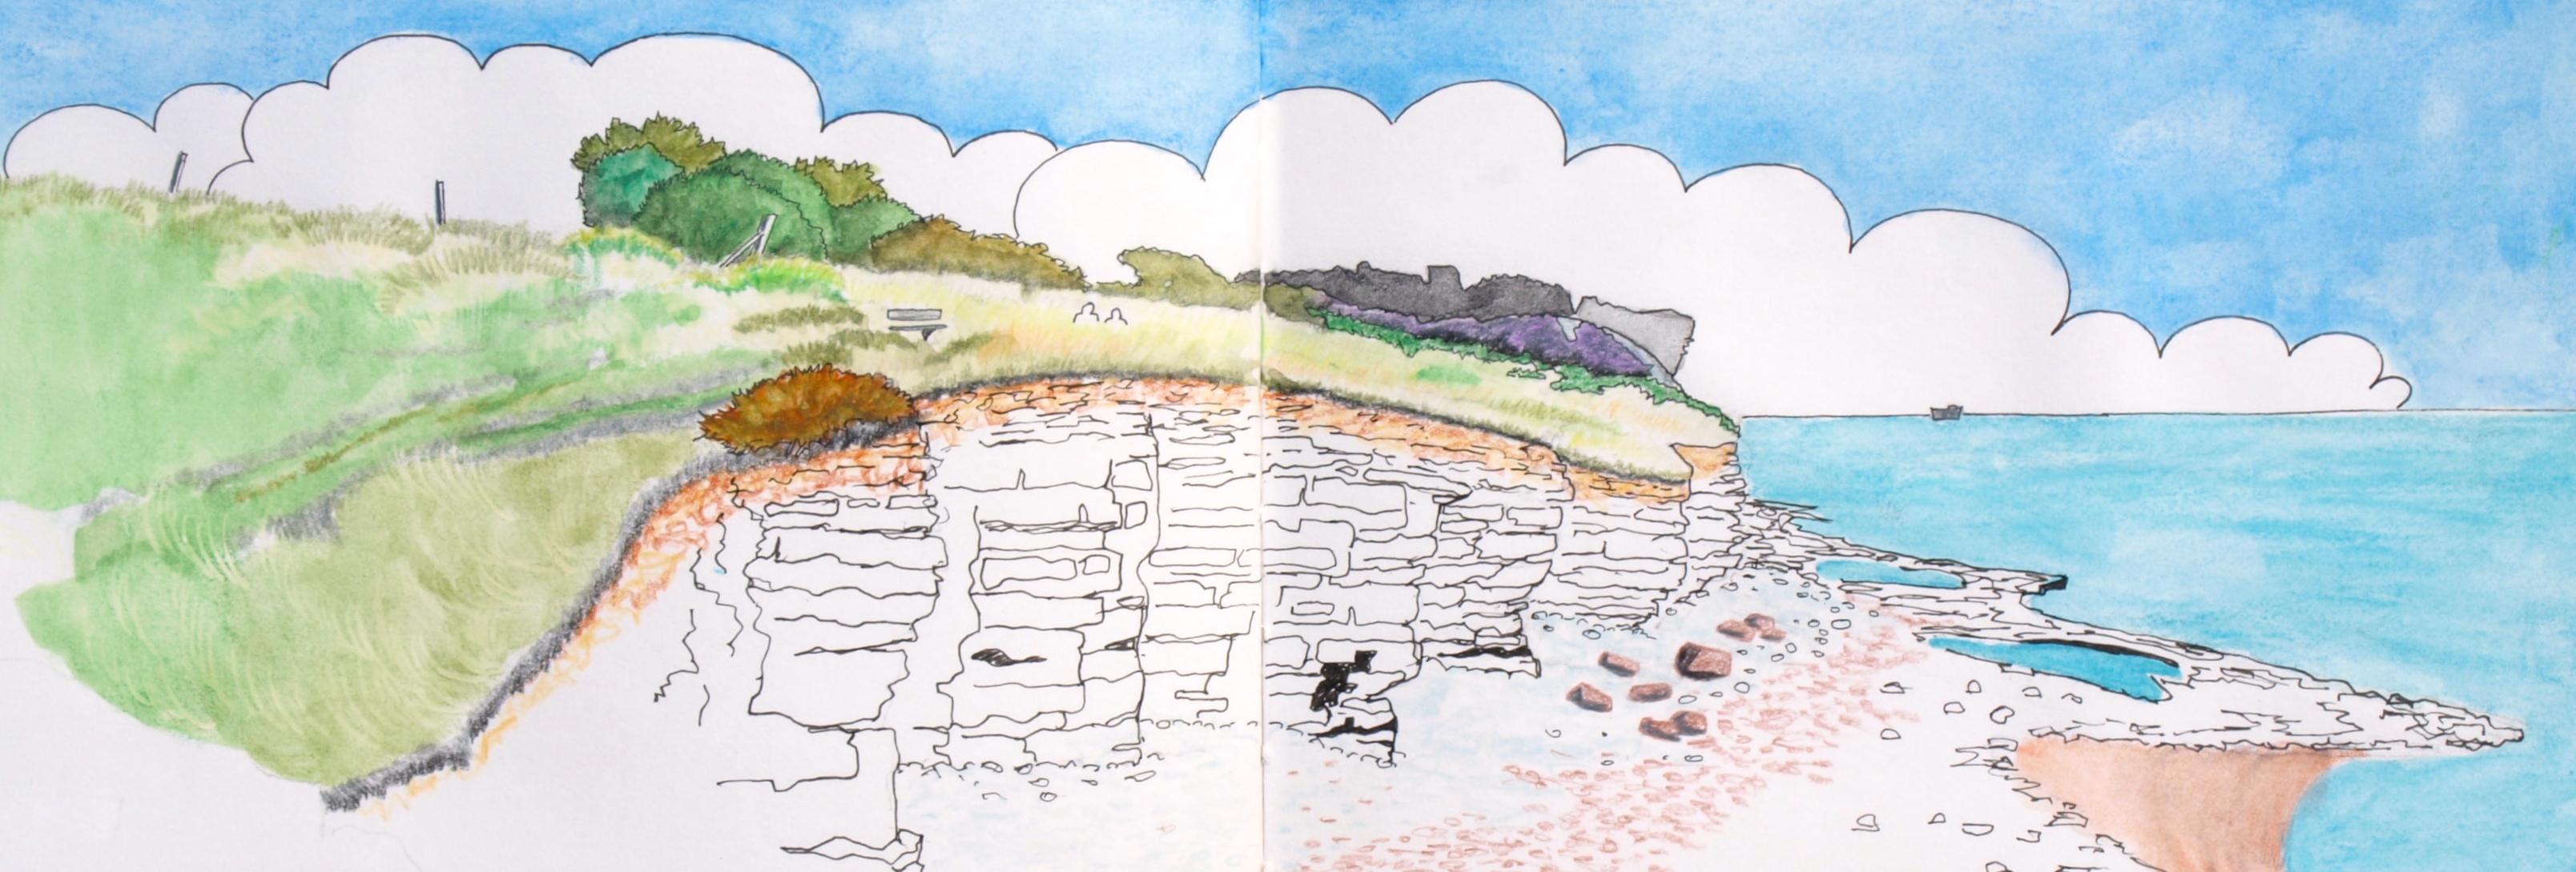 Dim Hole on the Heritage Coast by artist Martin Kaye